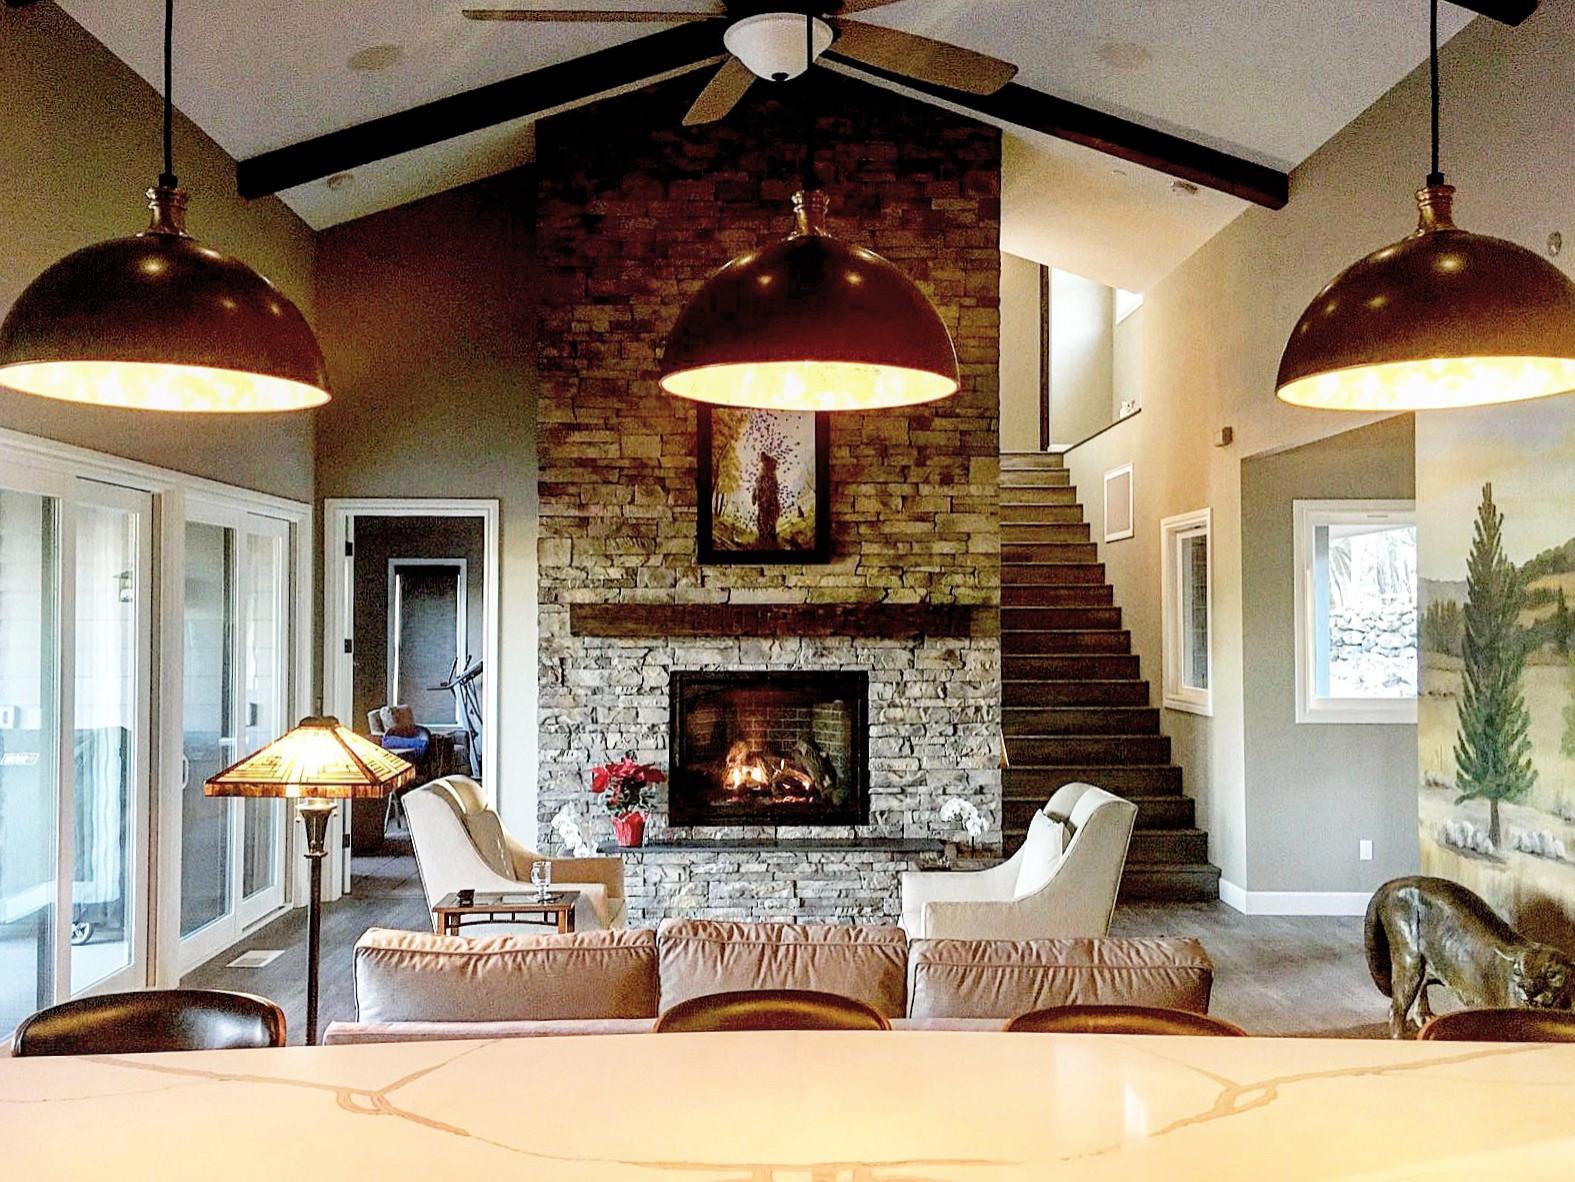 Home Sweet Home Living Room in Santa Rosa